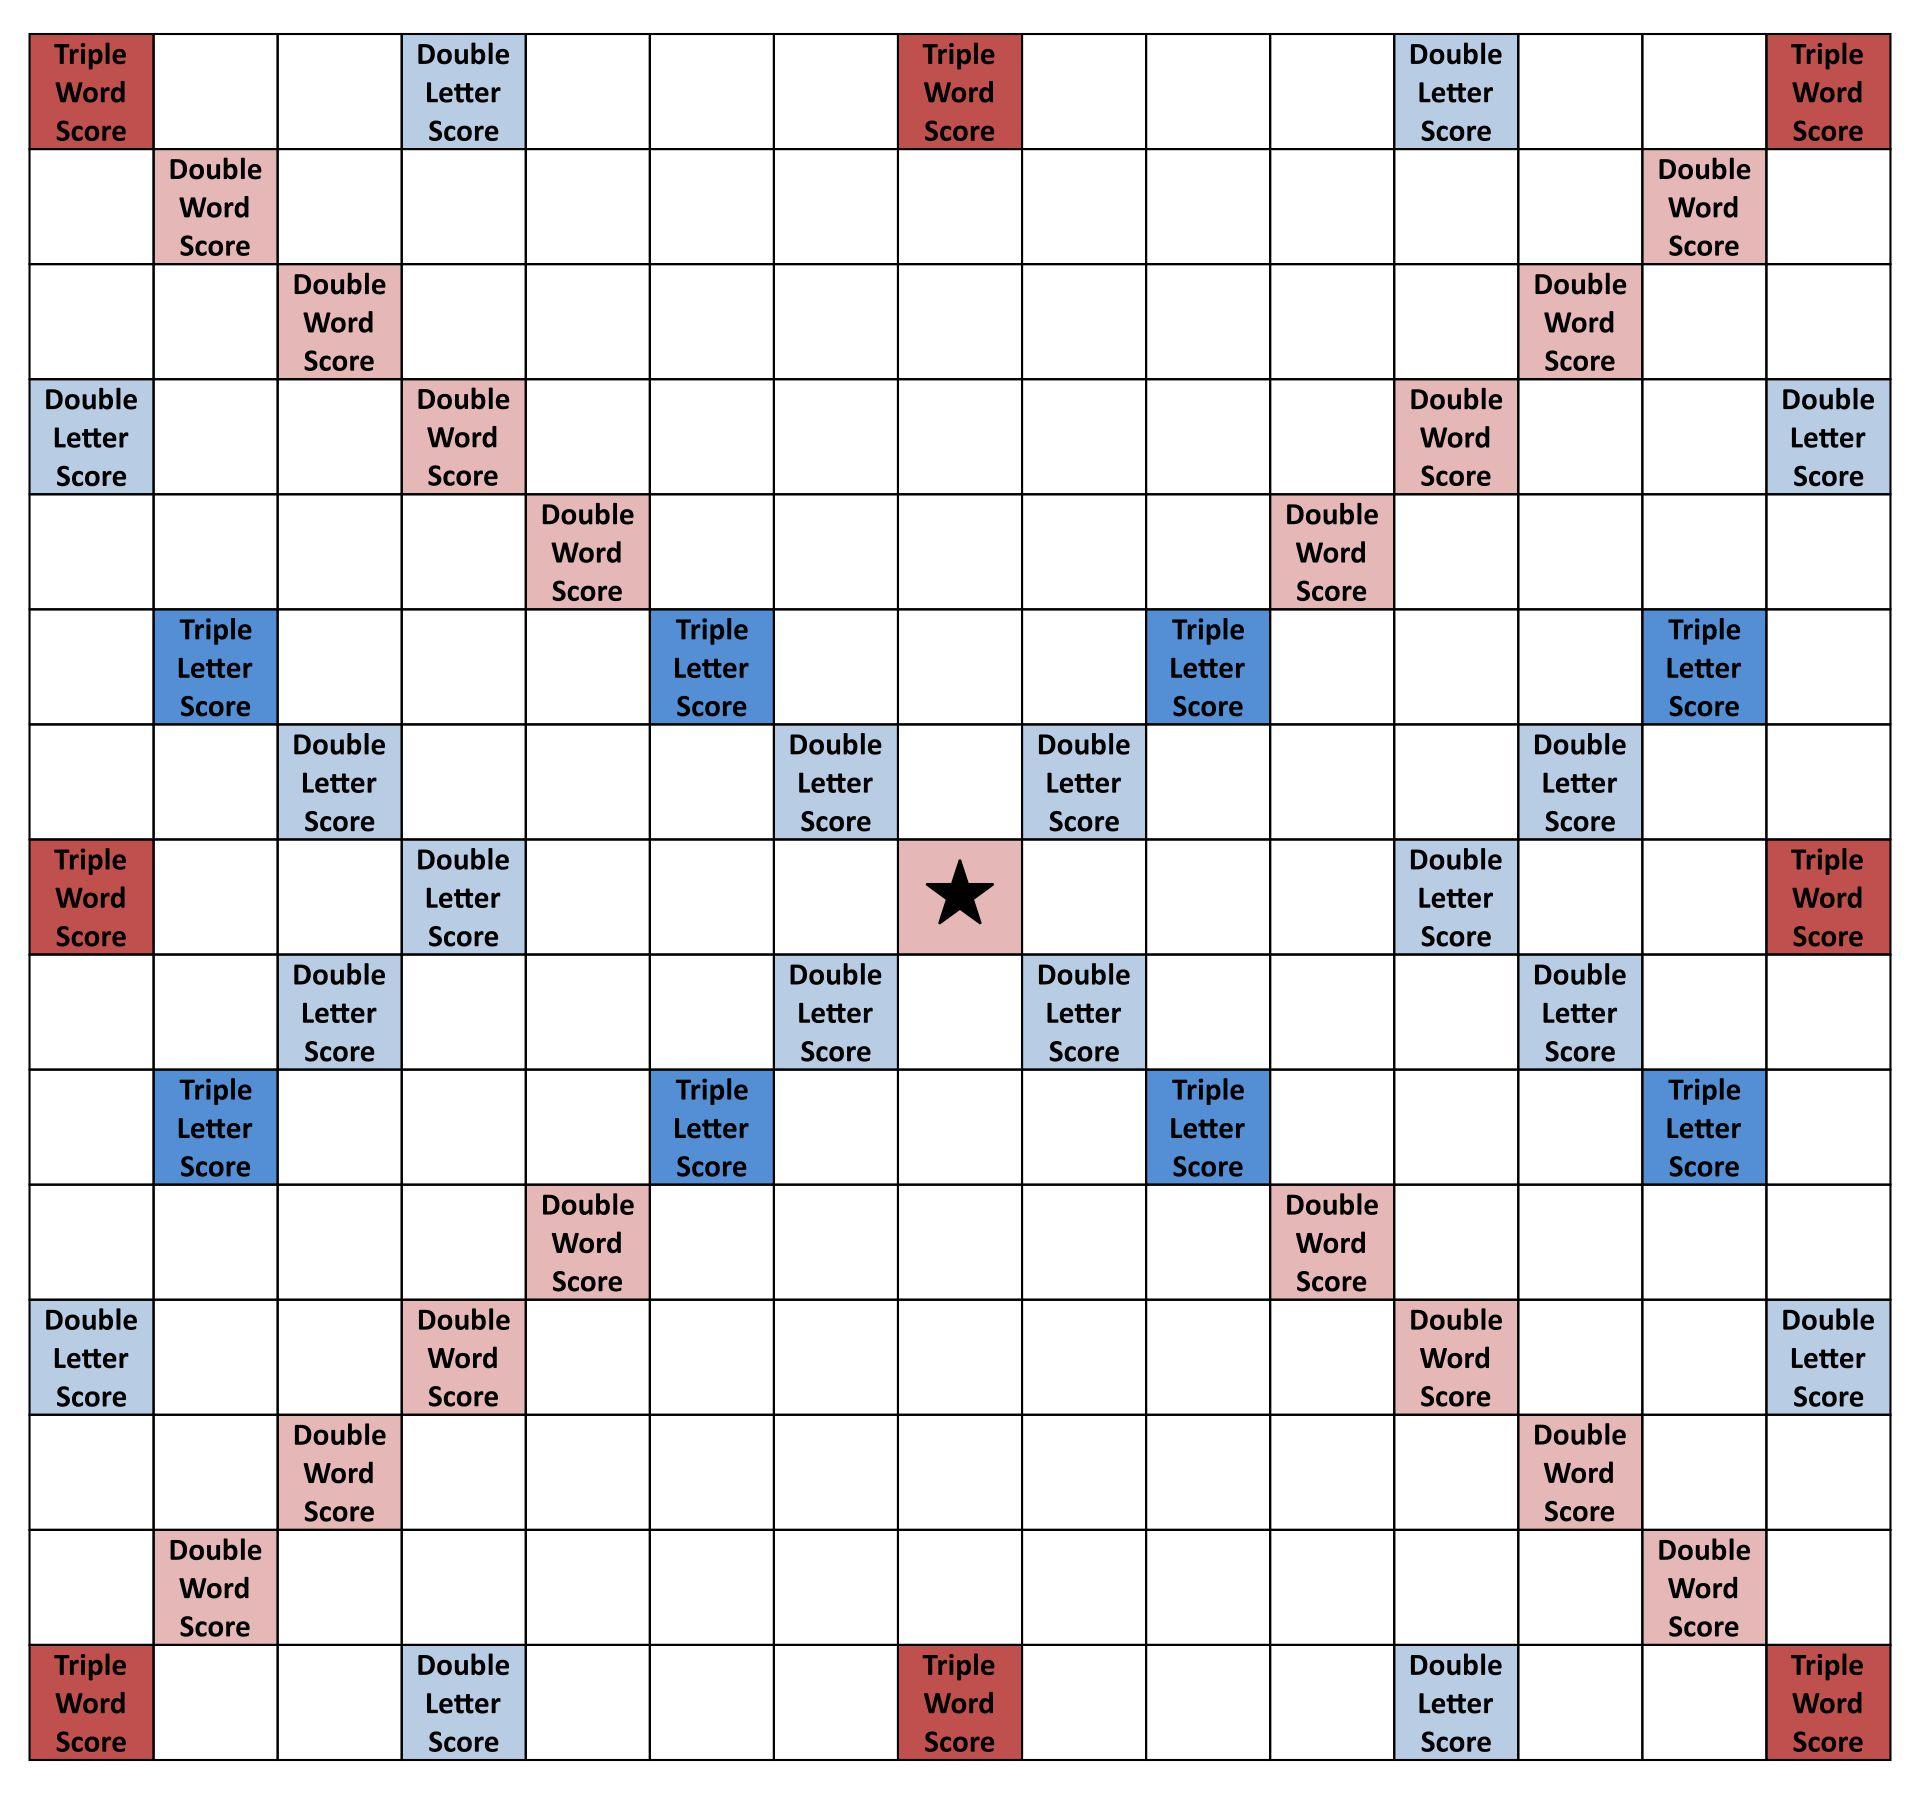 Printable Scrabble Board Game Tiles